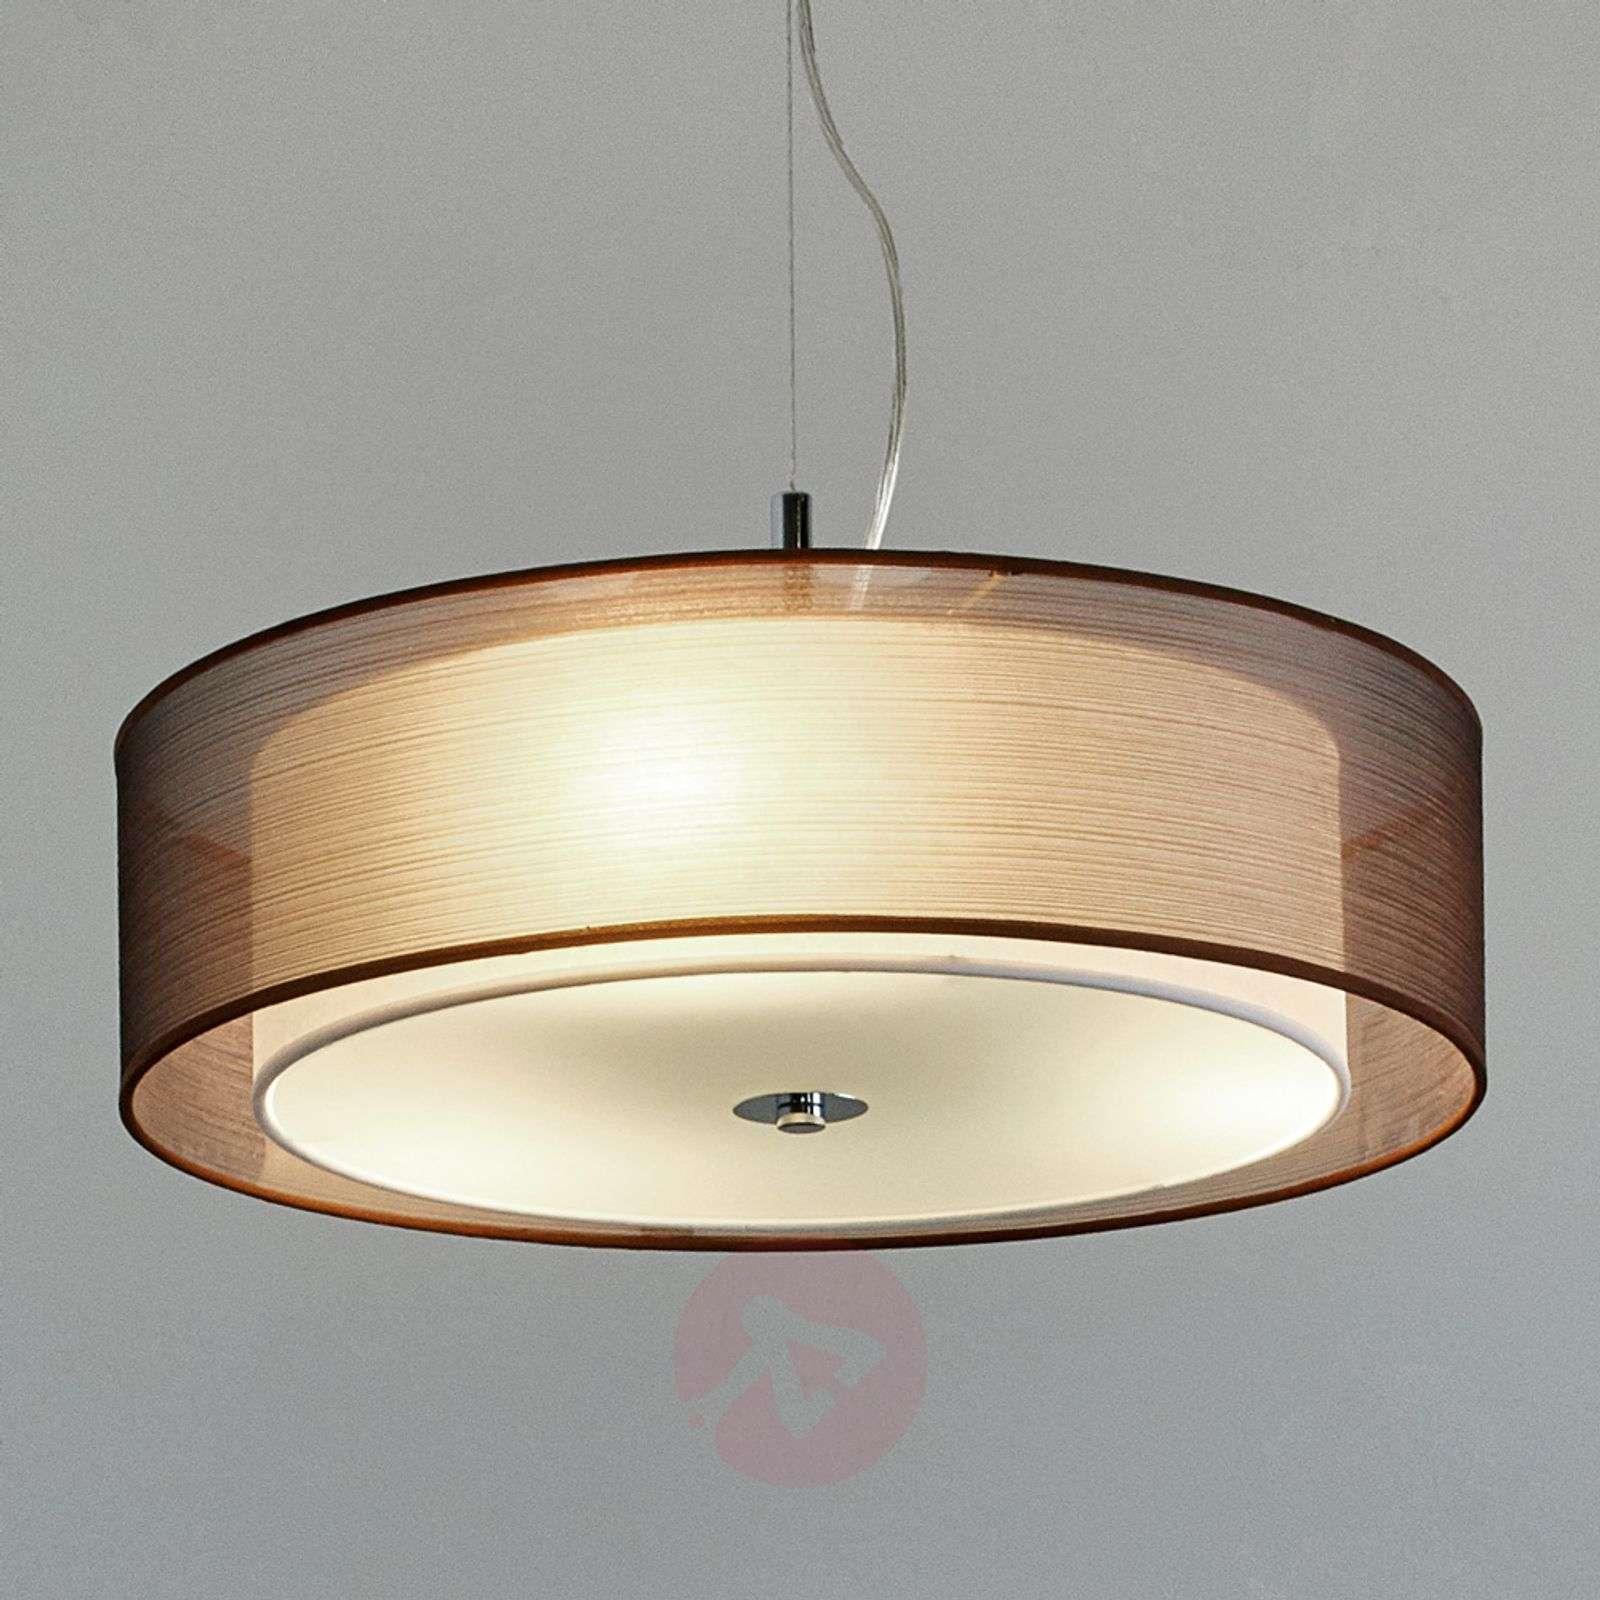 Ruskea tekstiiliriippuvalaisin Pikka, E27-LED:t-9620170-01